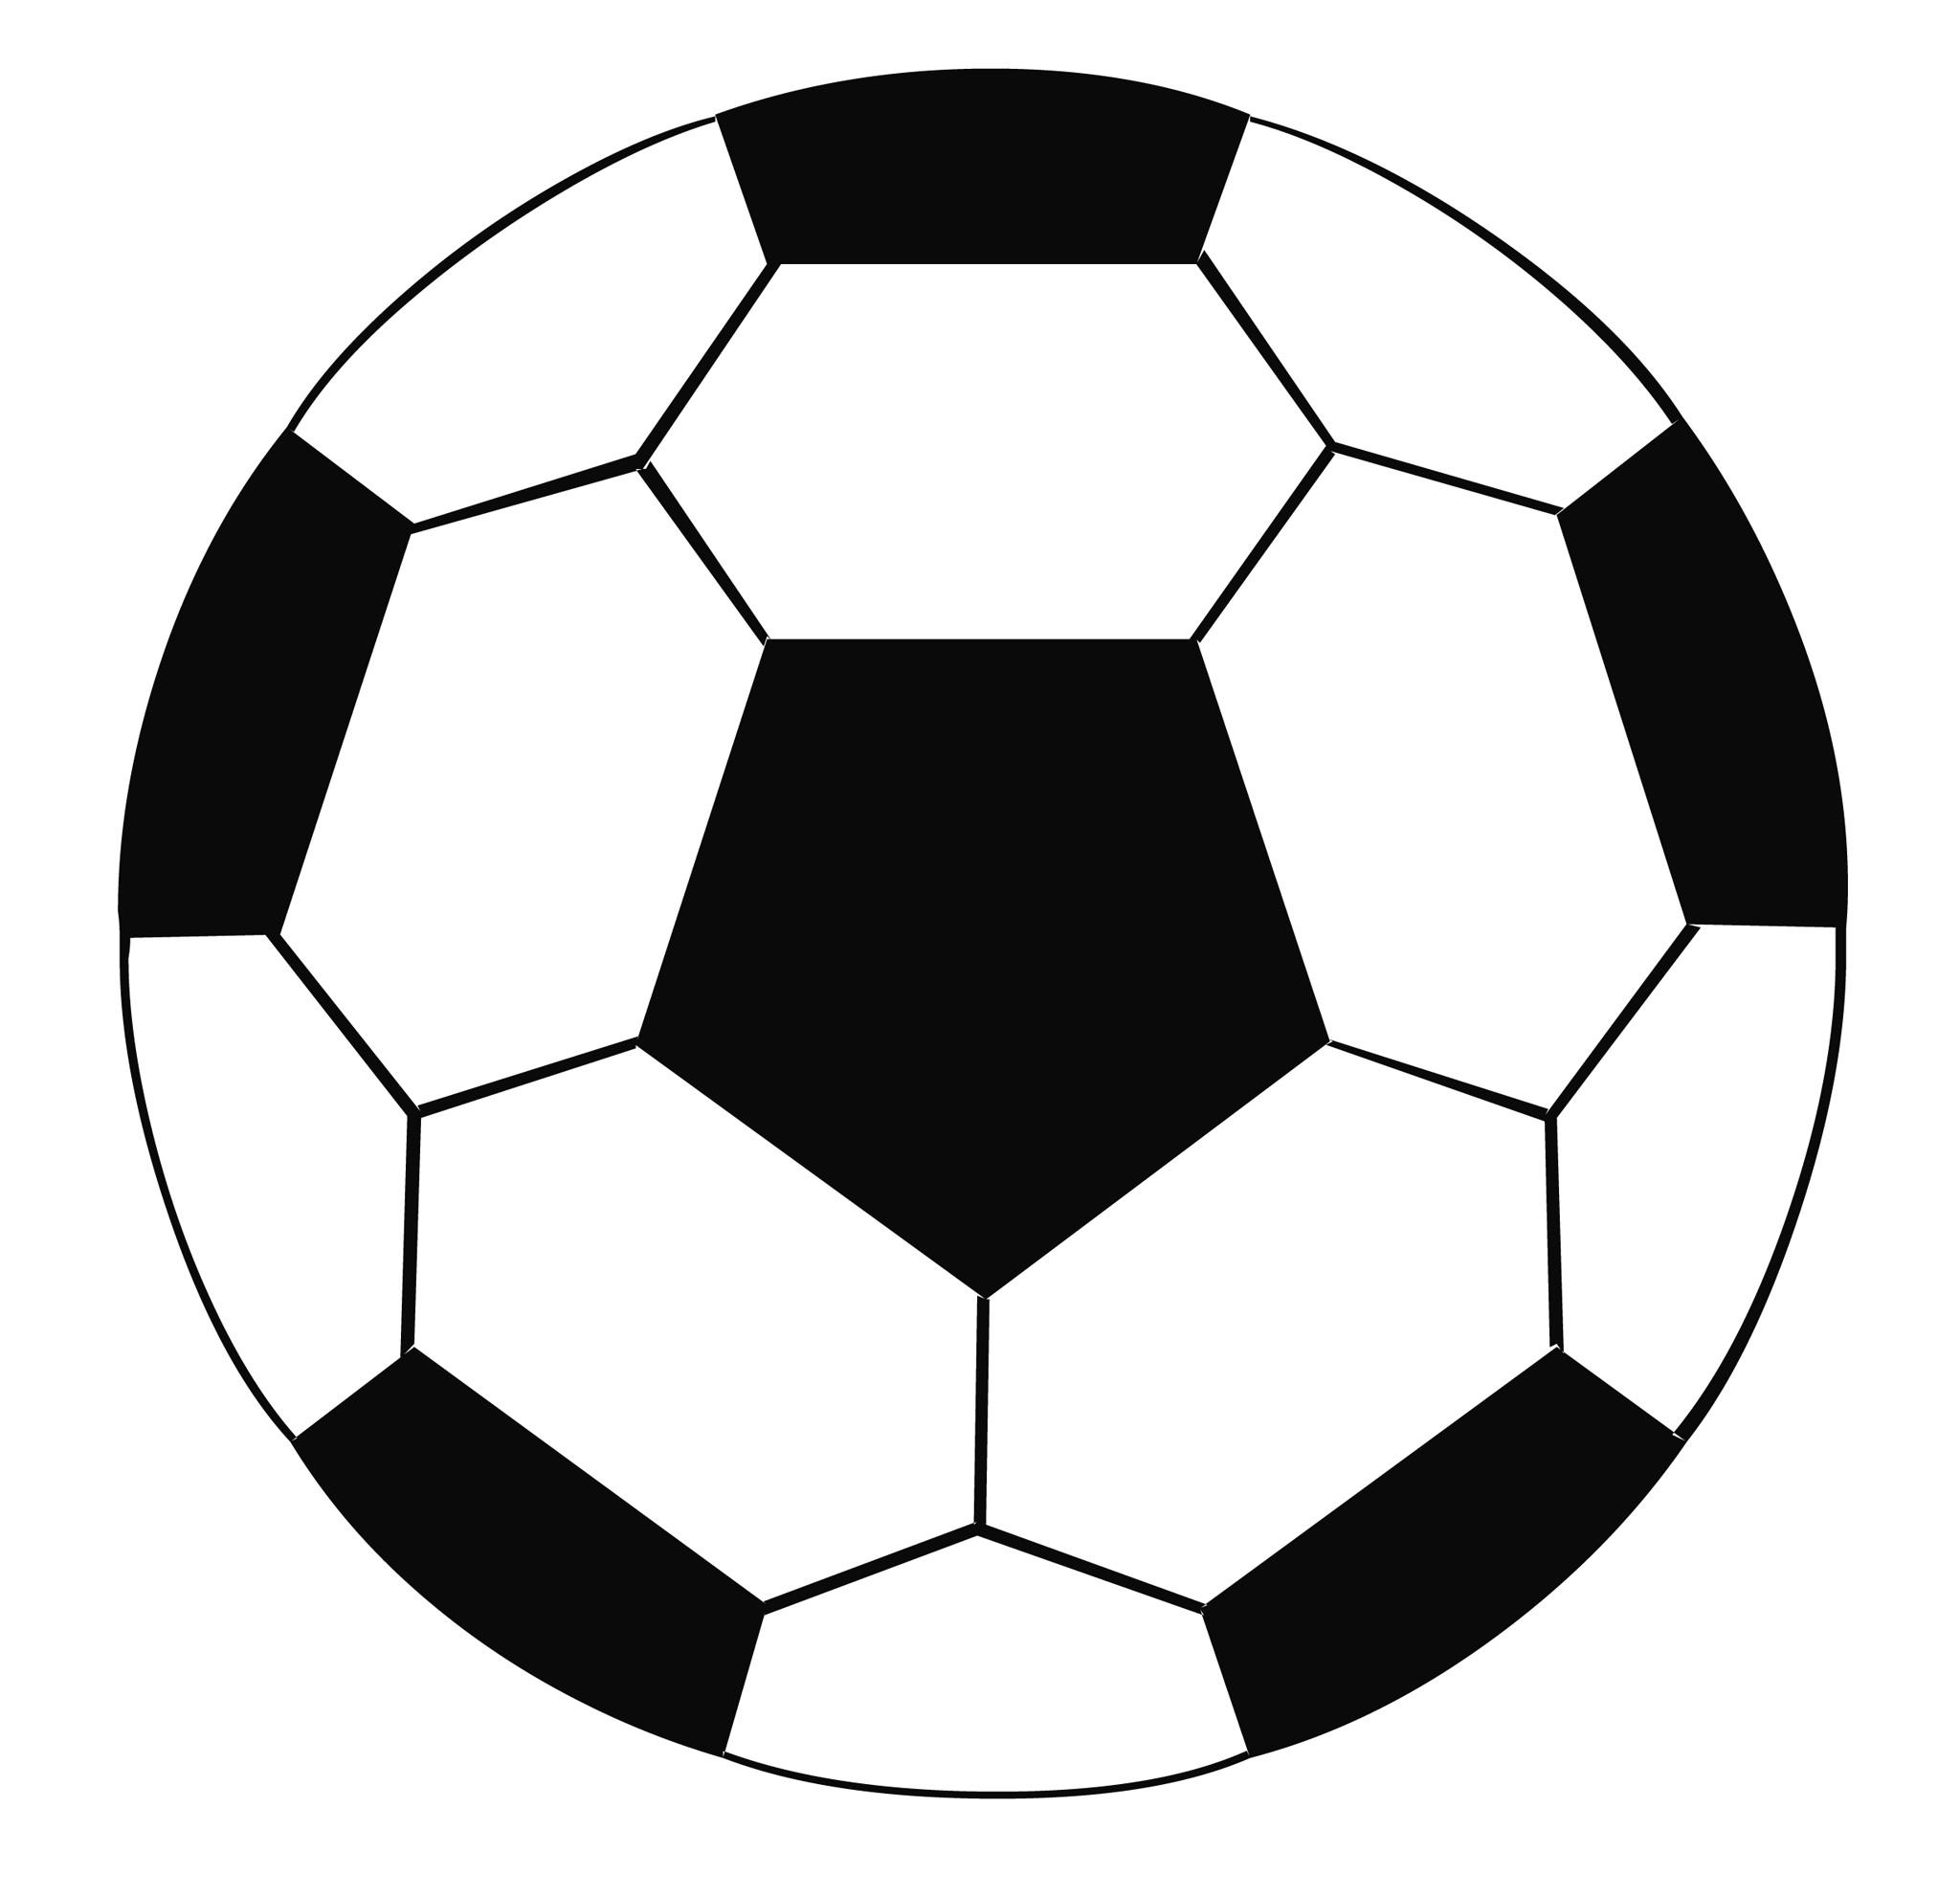 No Soccer Goal Clip Art.